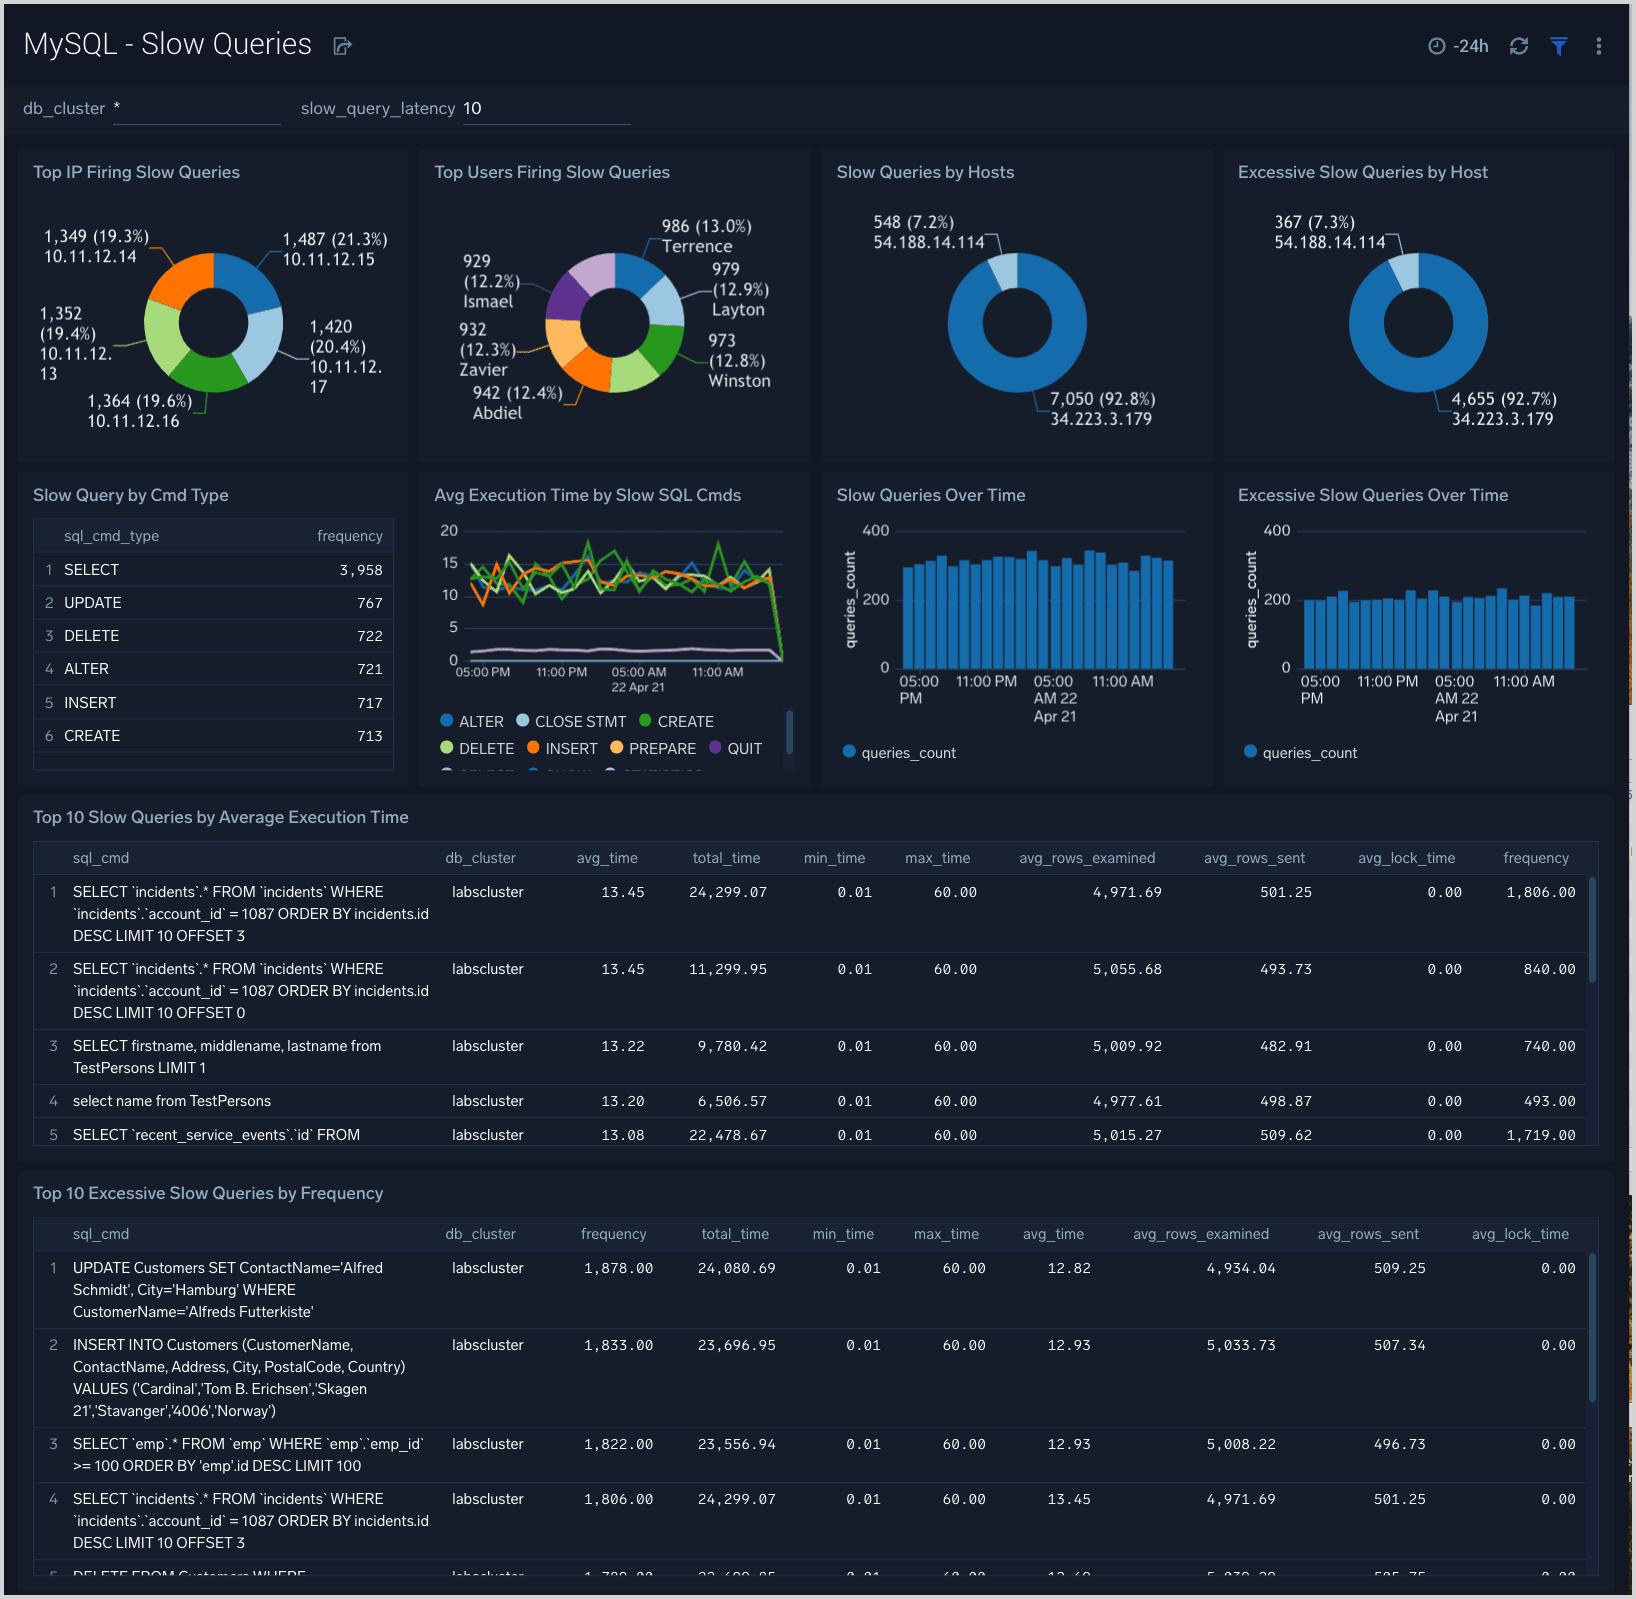 MySQL Slow Queries dashboard